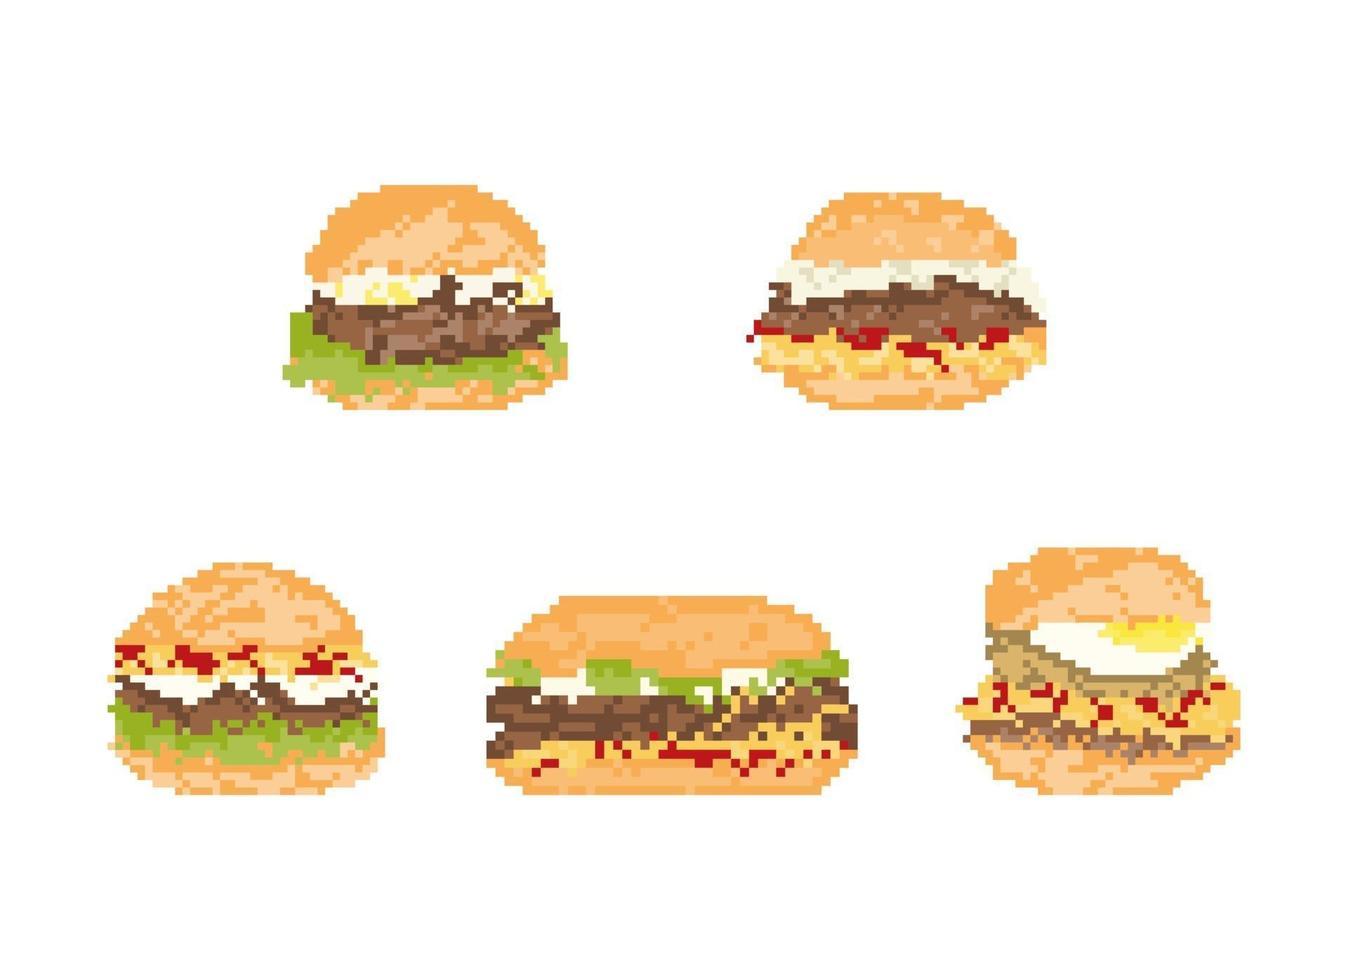 Satz Hamburger in der Pixelkunst. 8-Bit-Kunstvektorillustration. vektor